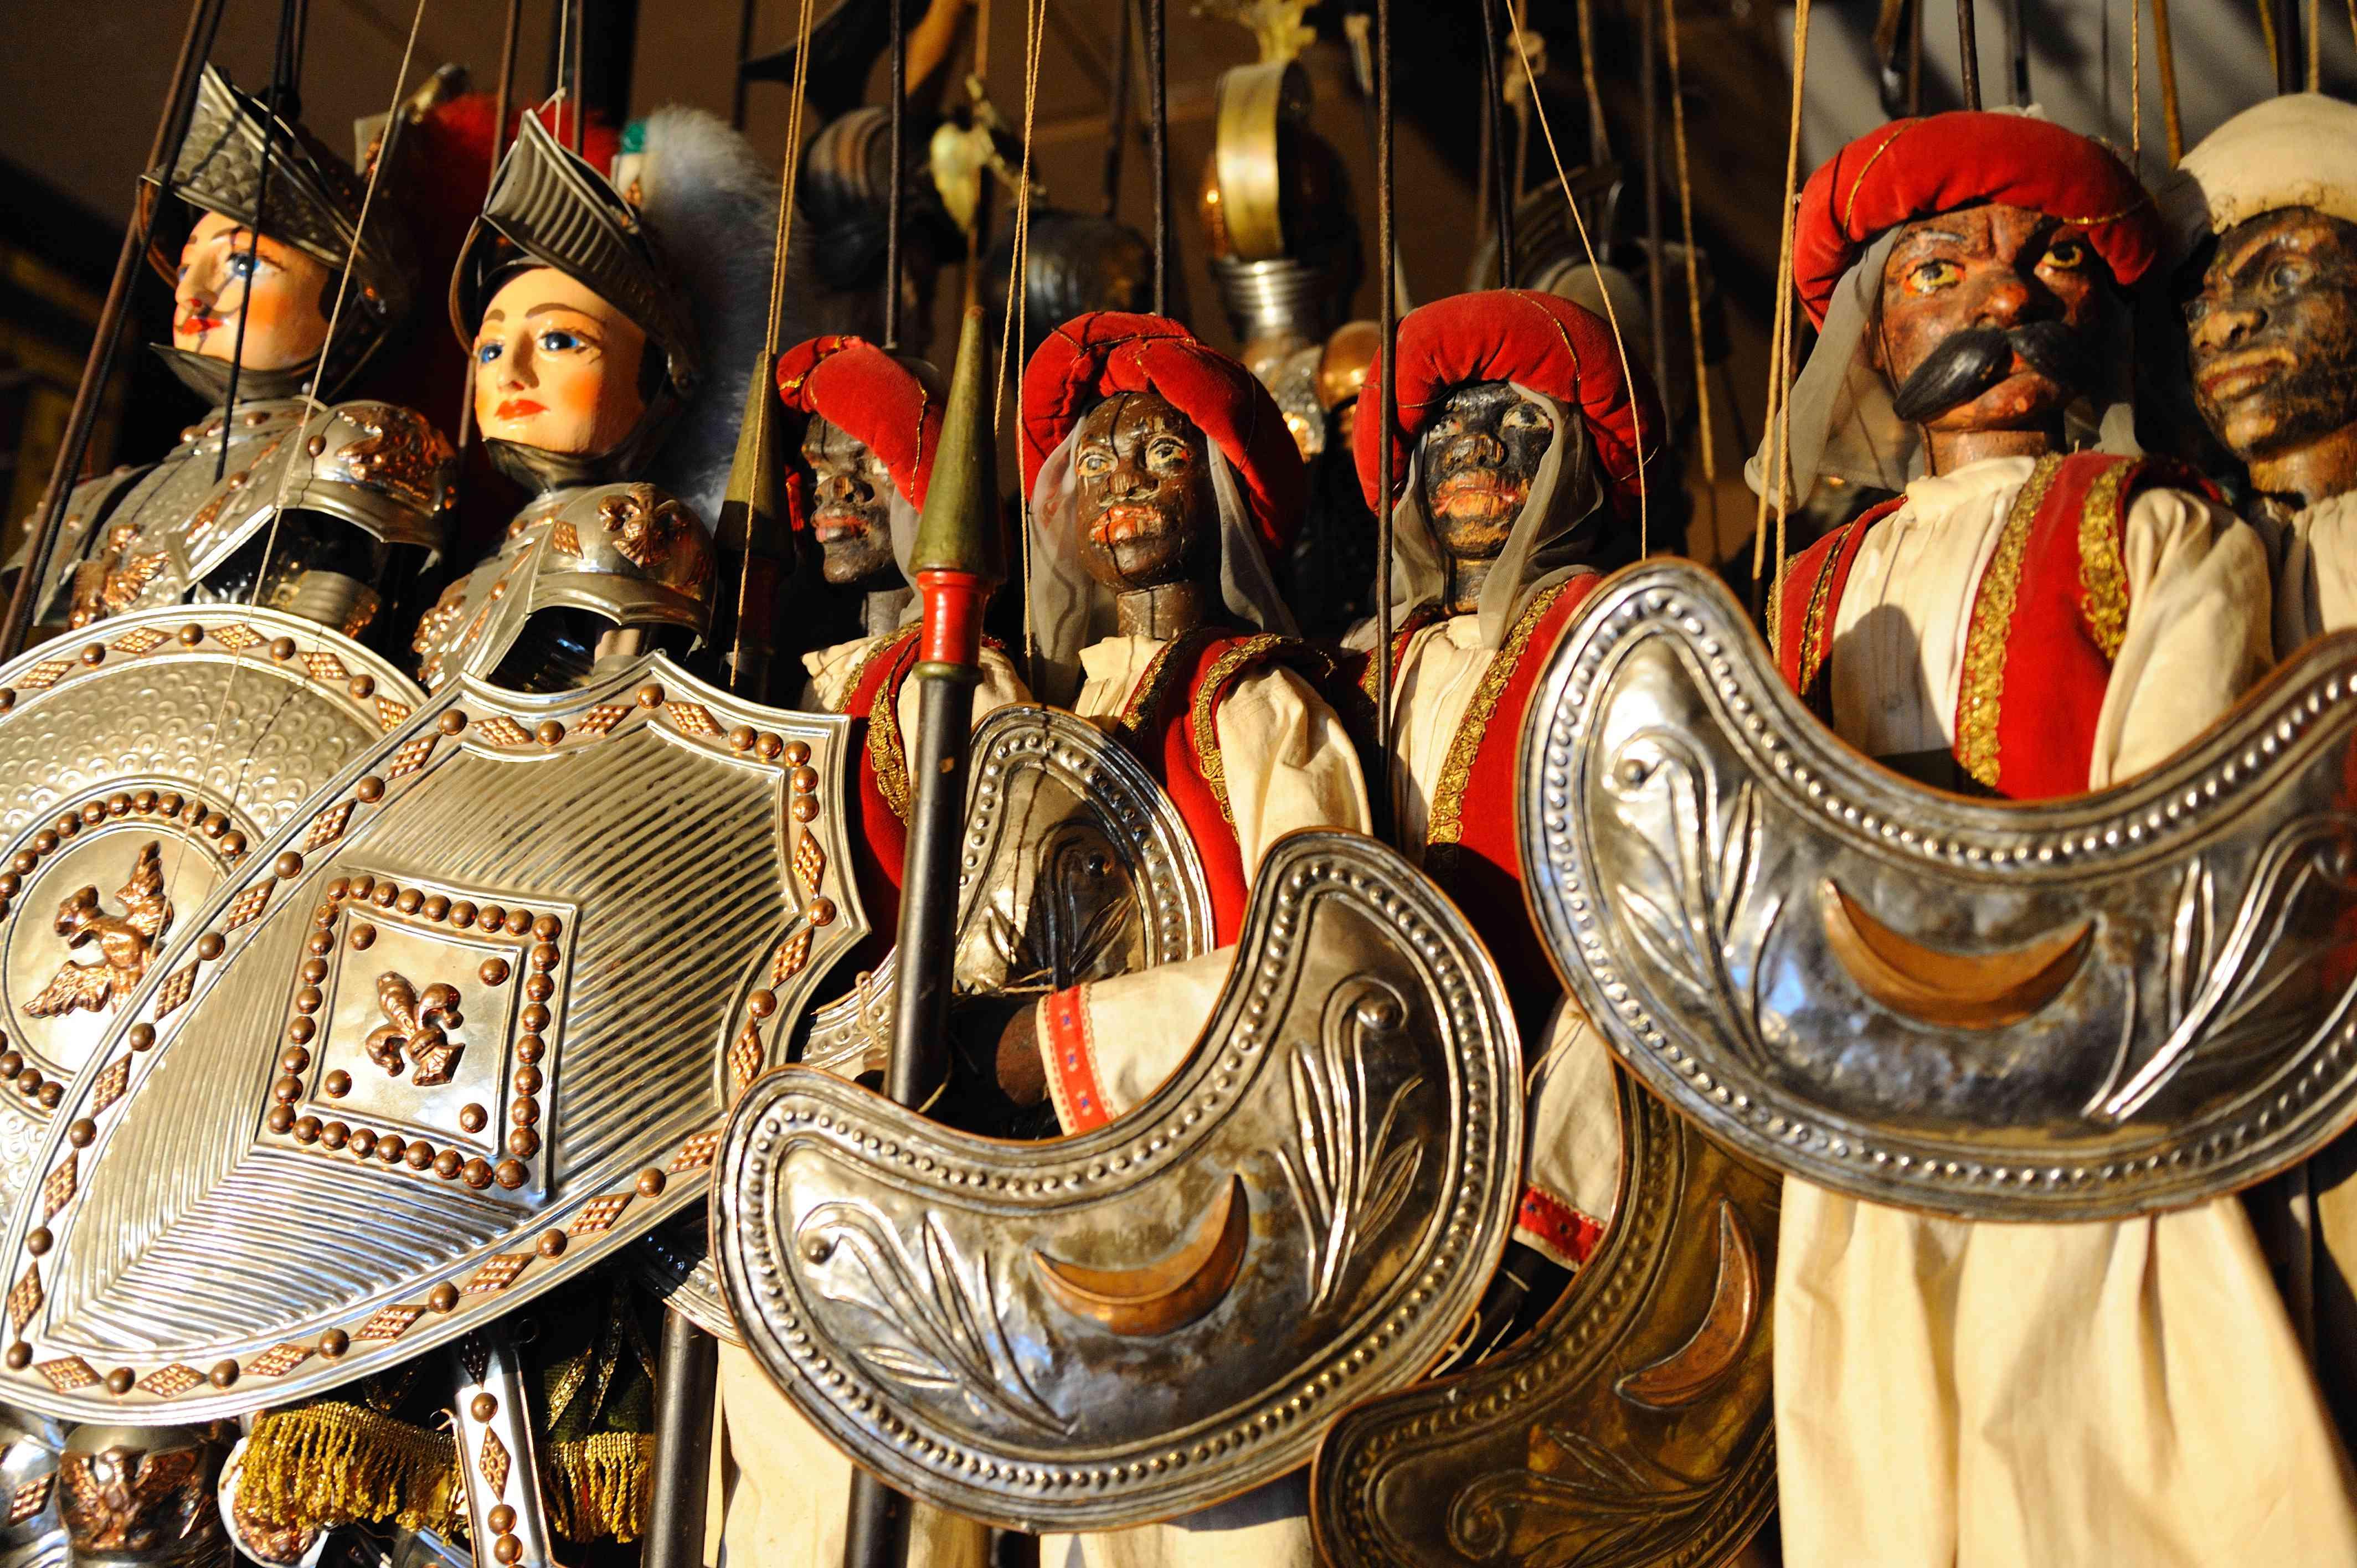 Marionettes on display at the Museo Internazionale delle Marionette Antonio Pasqualino, Palermo